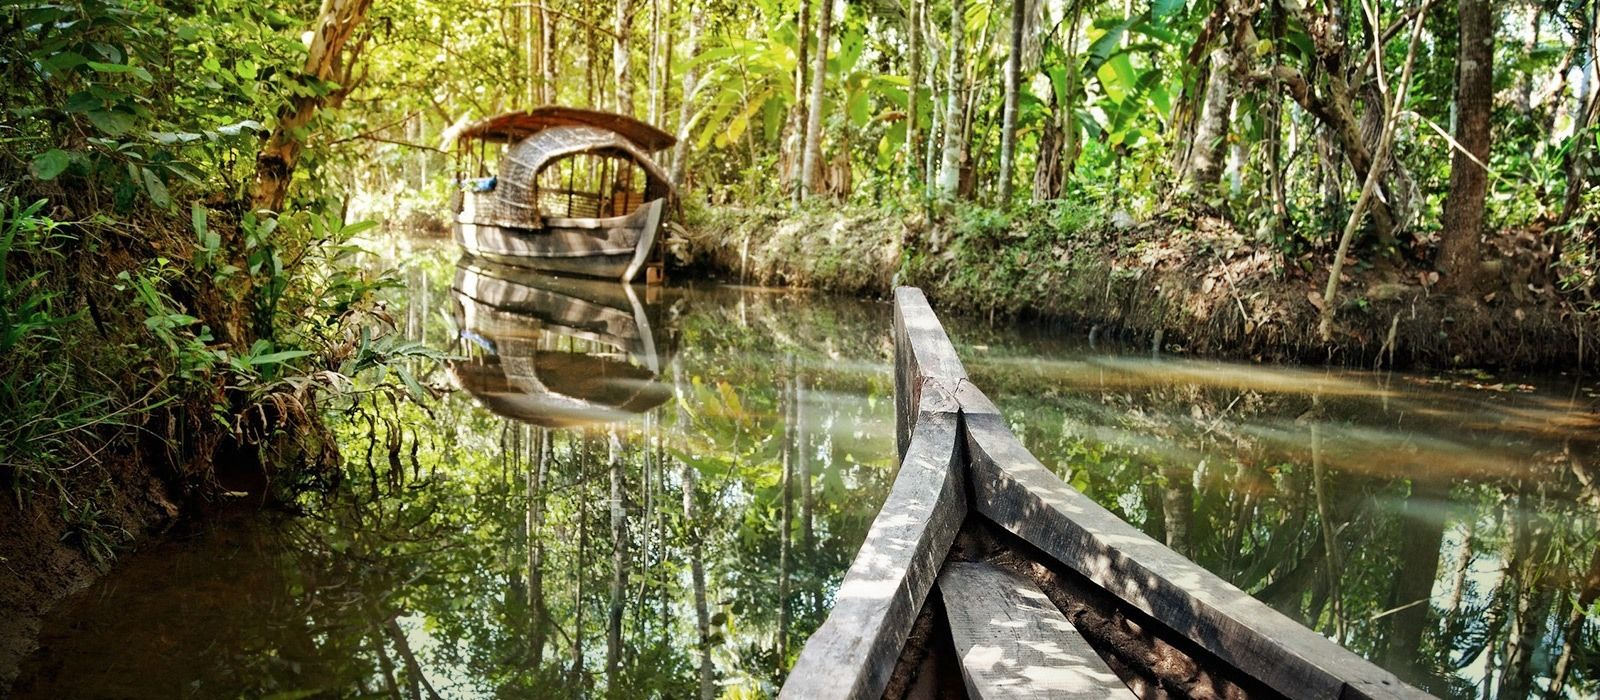 Ayurveda Reise: Erholung pur in Kerala Urlaub 1